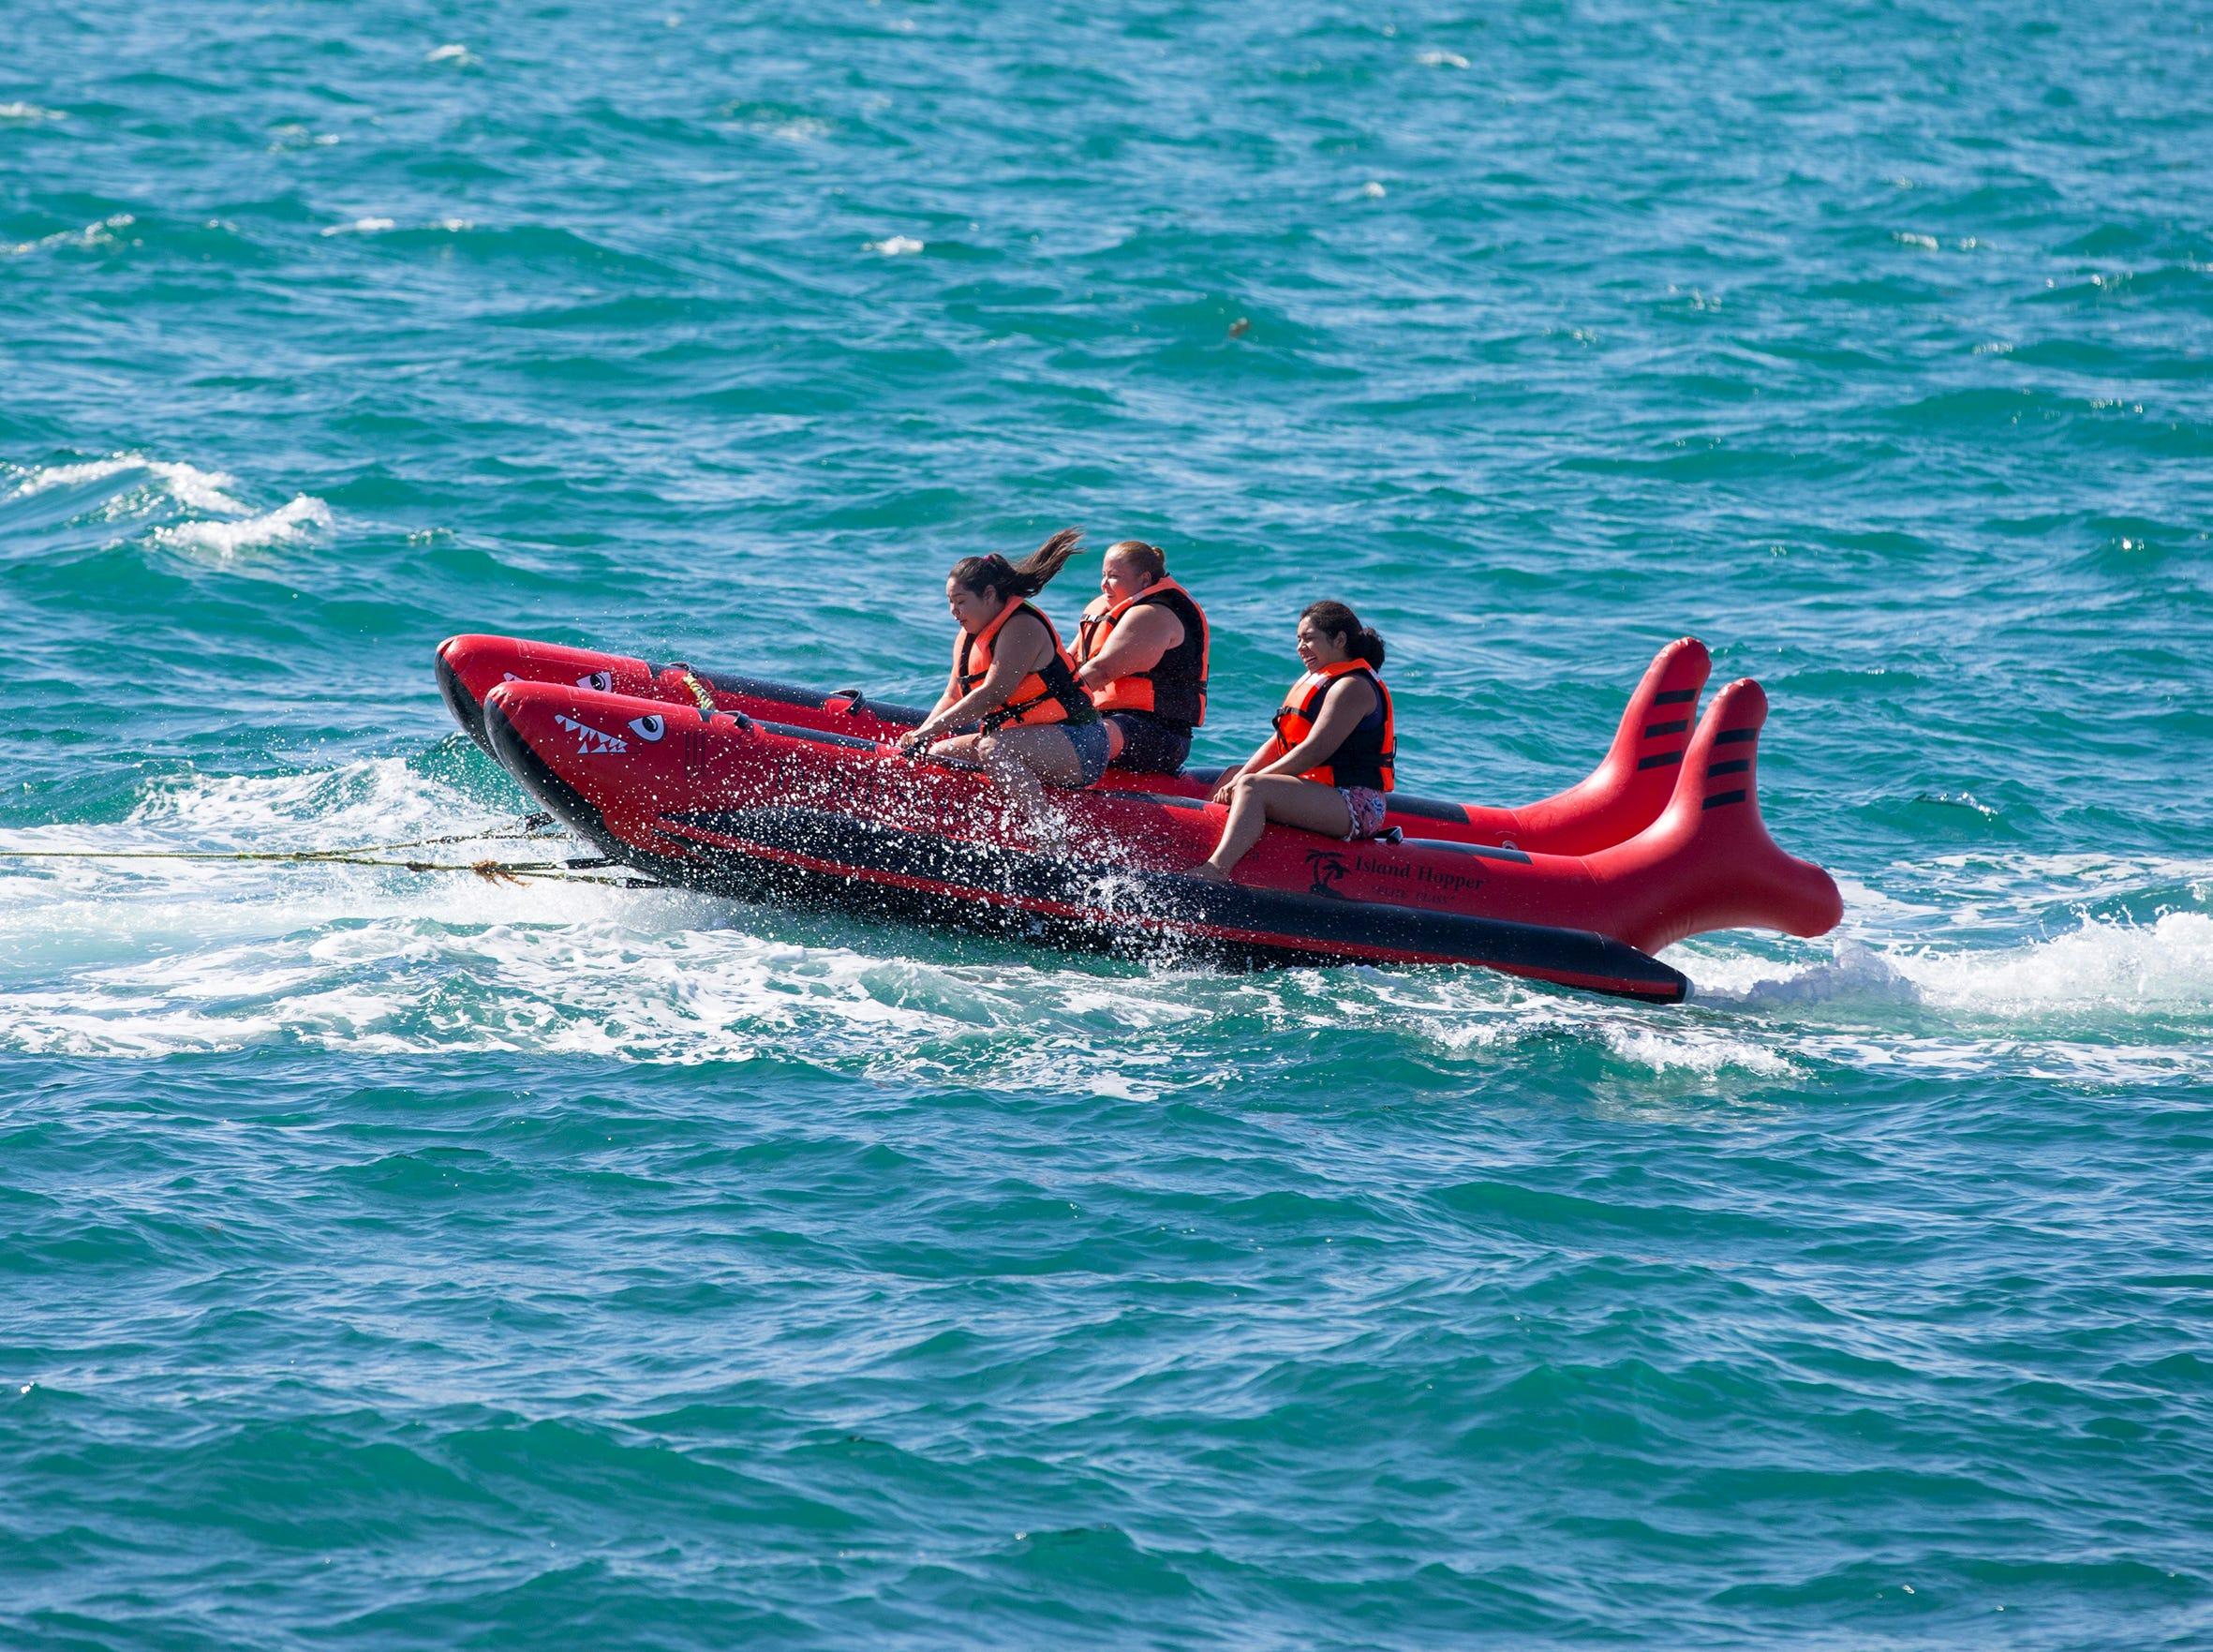 Banana boats are a popular form of entertainment in Puerto Penasco, Mexico.